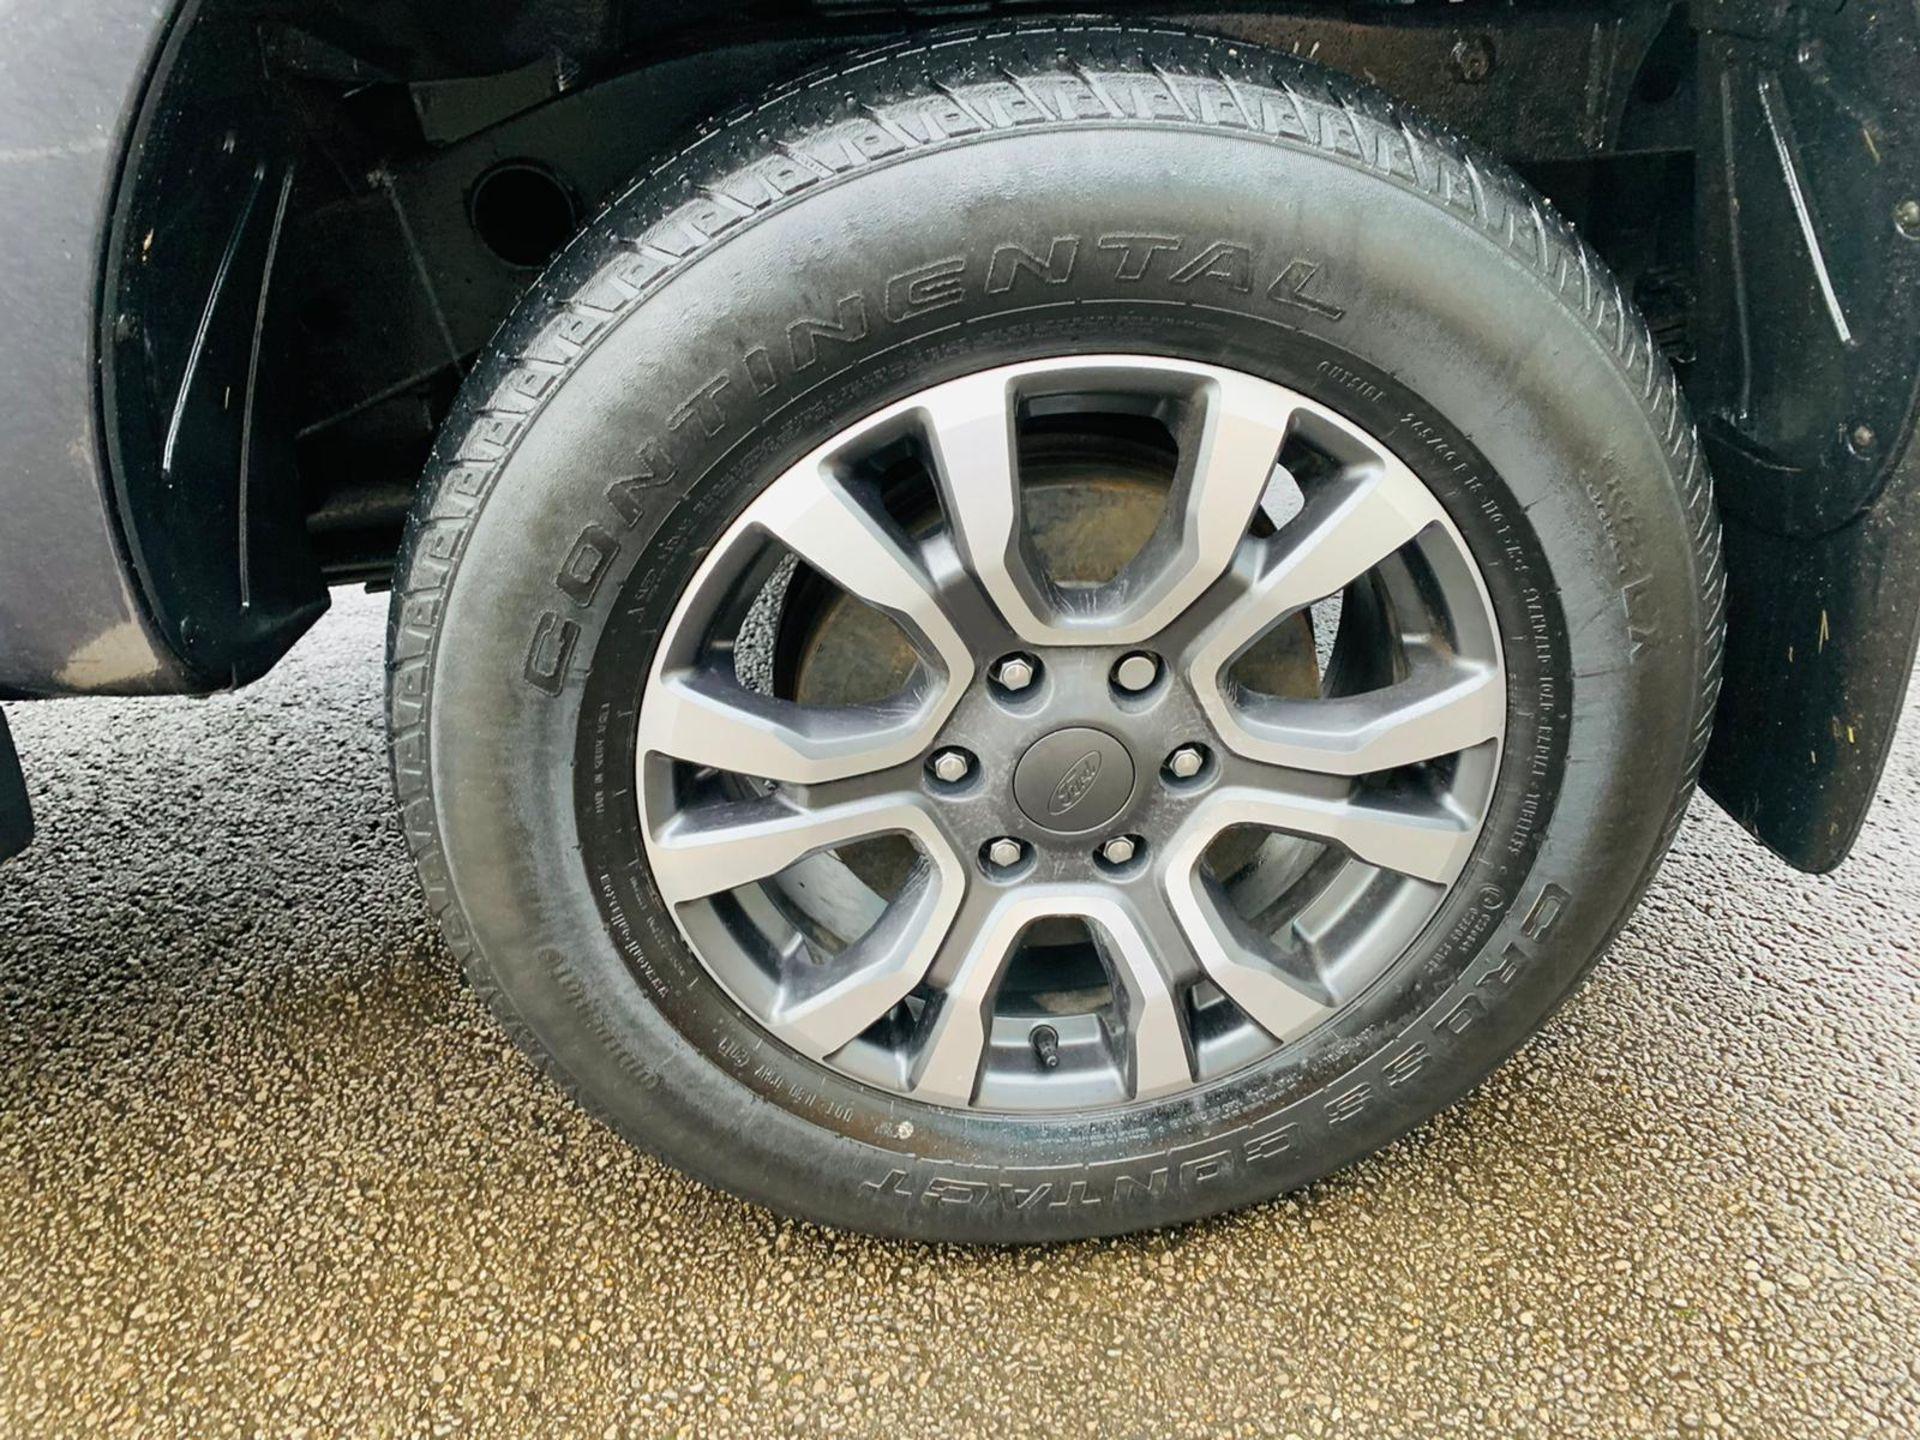 (RESERVE MET) Ford Ranger 2.2 TDCI LTD 4x4 Double Cab 2017 17 Reg - Reversing Cam -Leather - Sat Nav - Image 14 of 32